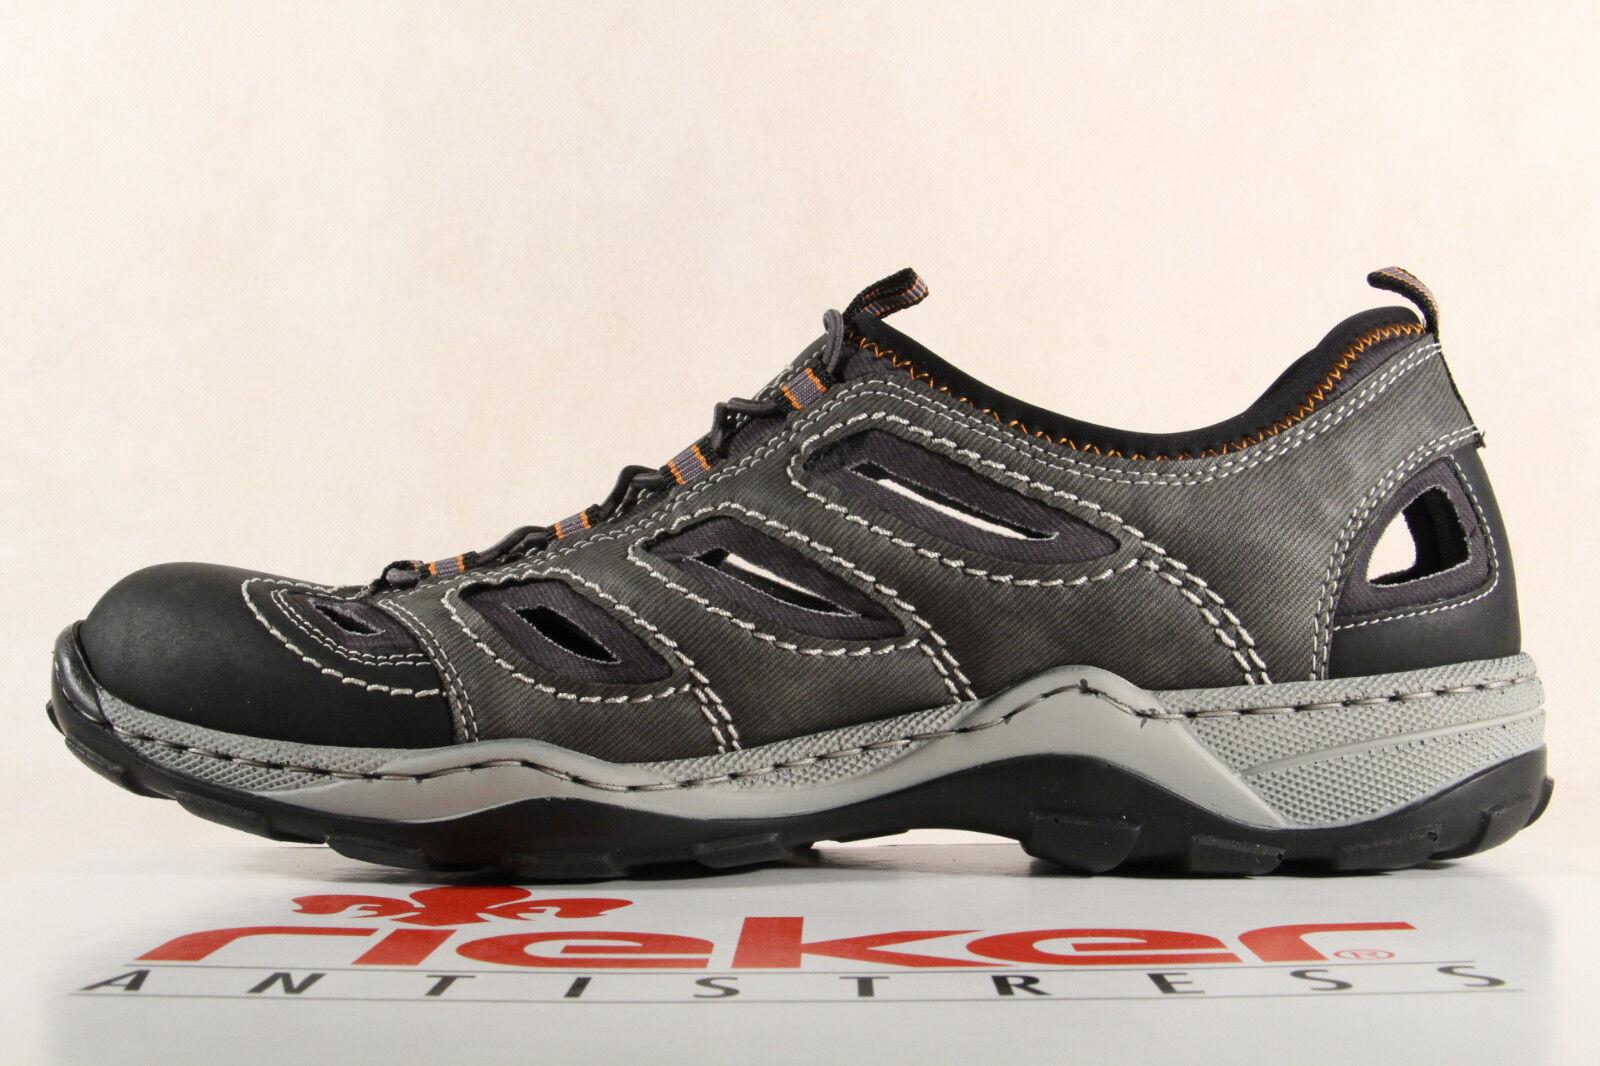 RIEKER Slipper scarpe da ginnastica scarpe morbida basse grigio in pelle morbida scarpe suola interna 08065 NUOVO 8af3de